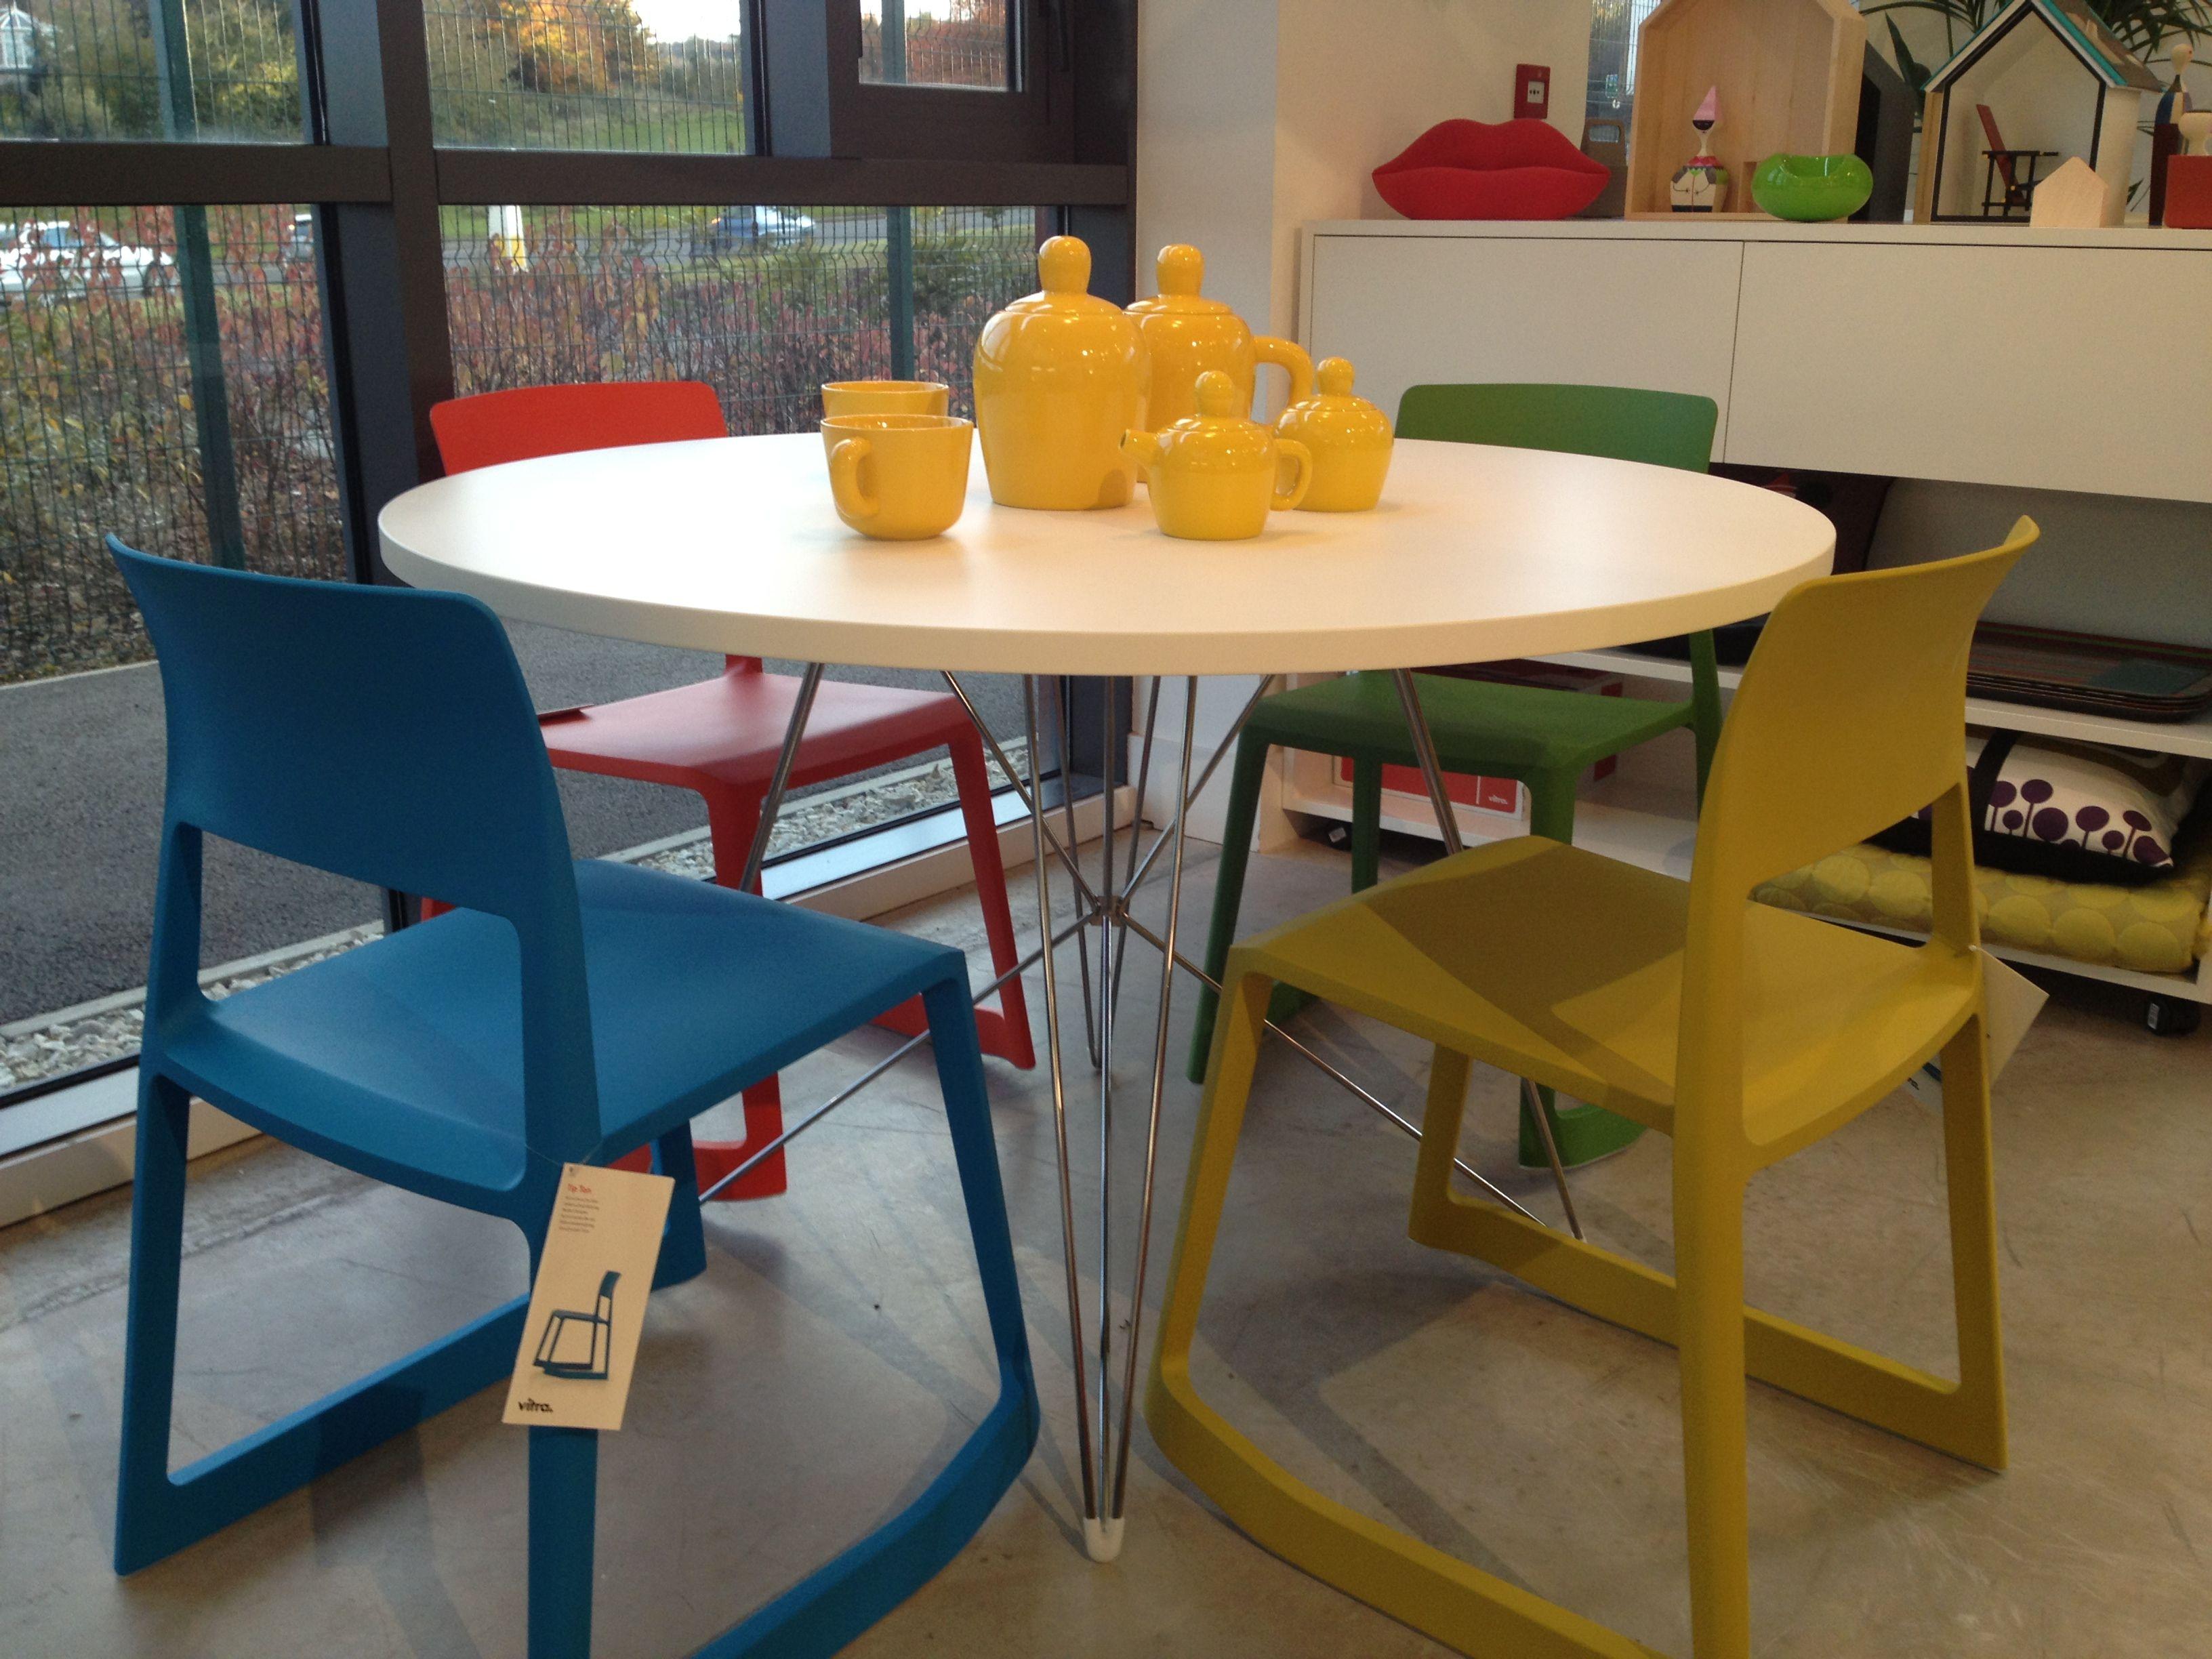 Immagini tavolo ~ Time for tea magis tavolo xz table vitra tip ton chairs and